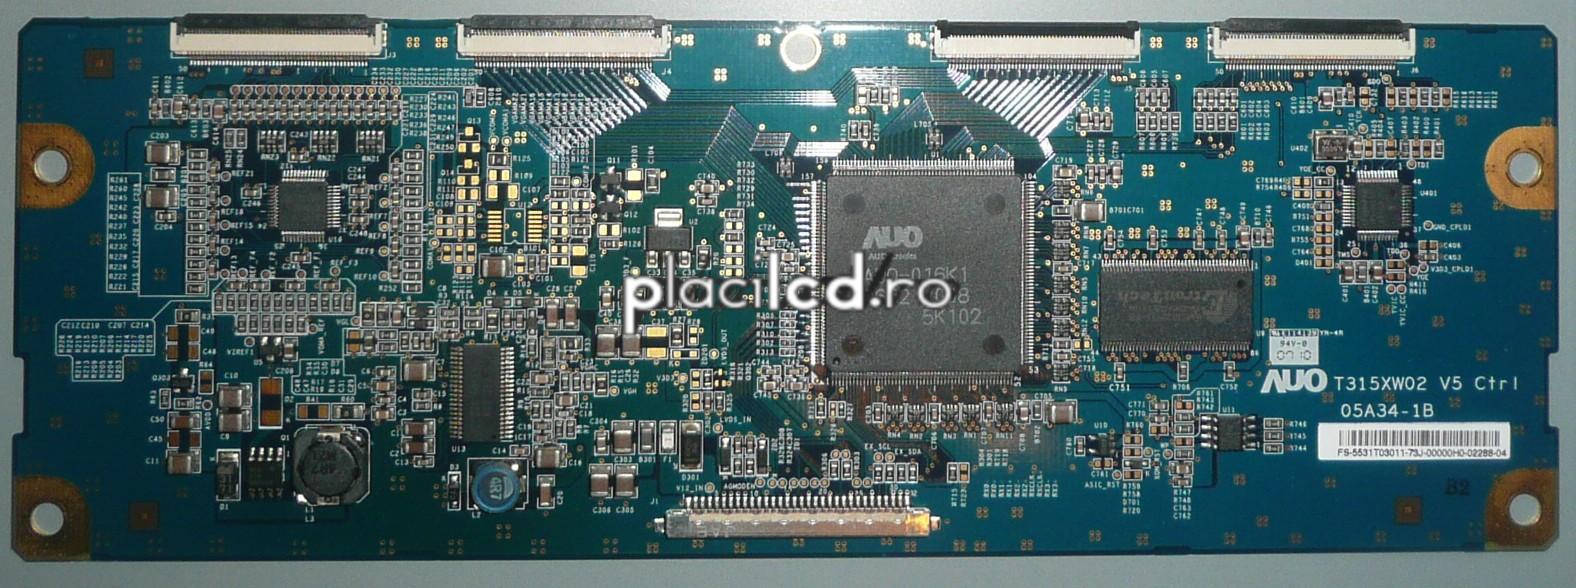 Placa LVDS T315XW02 V.5 (05A34-1B)